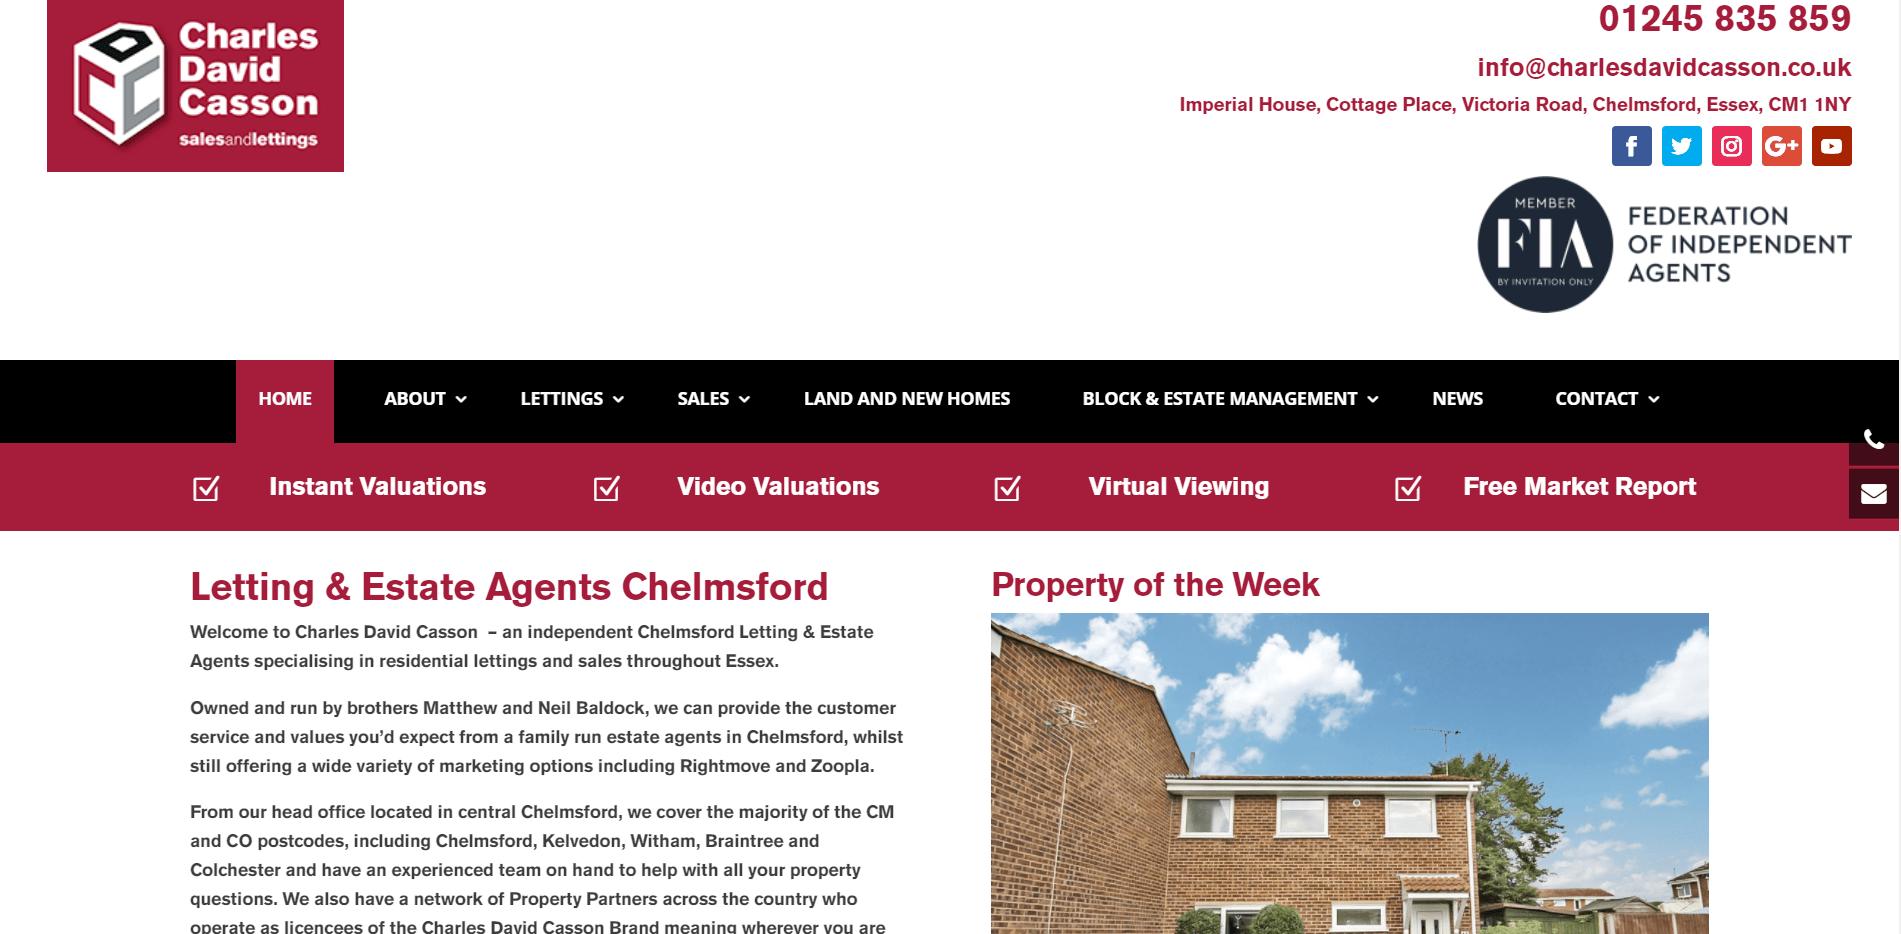 Charles David Casson Estate Agents Chelmsford